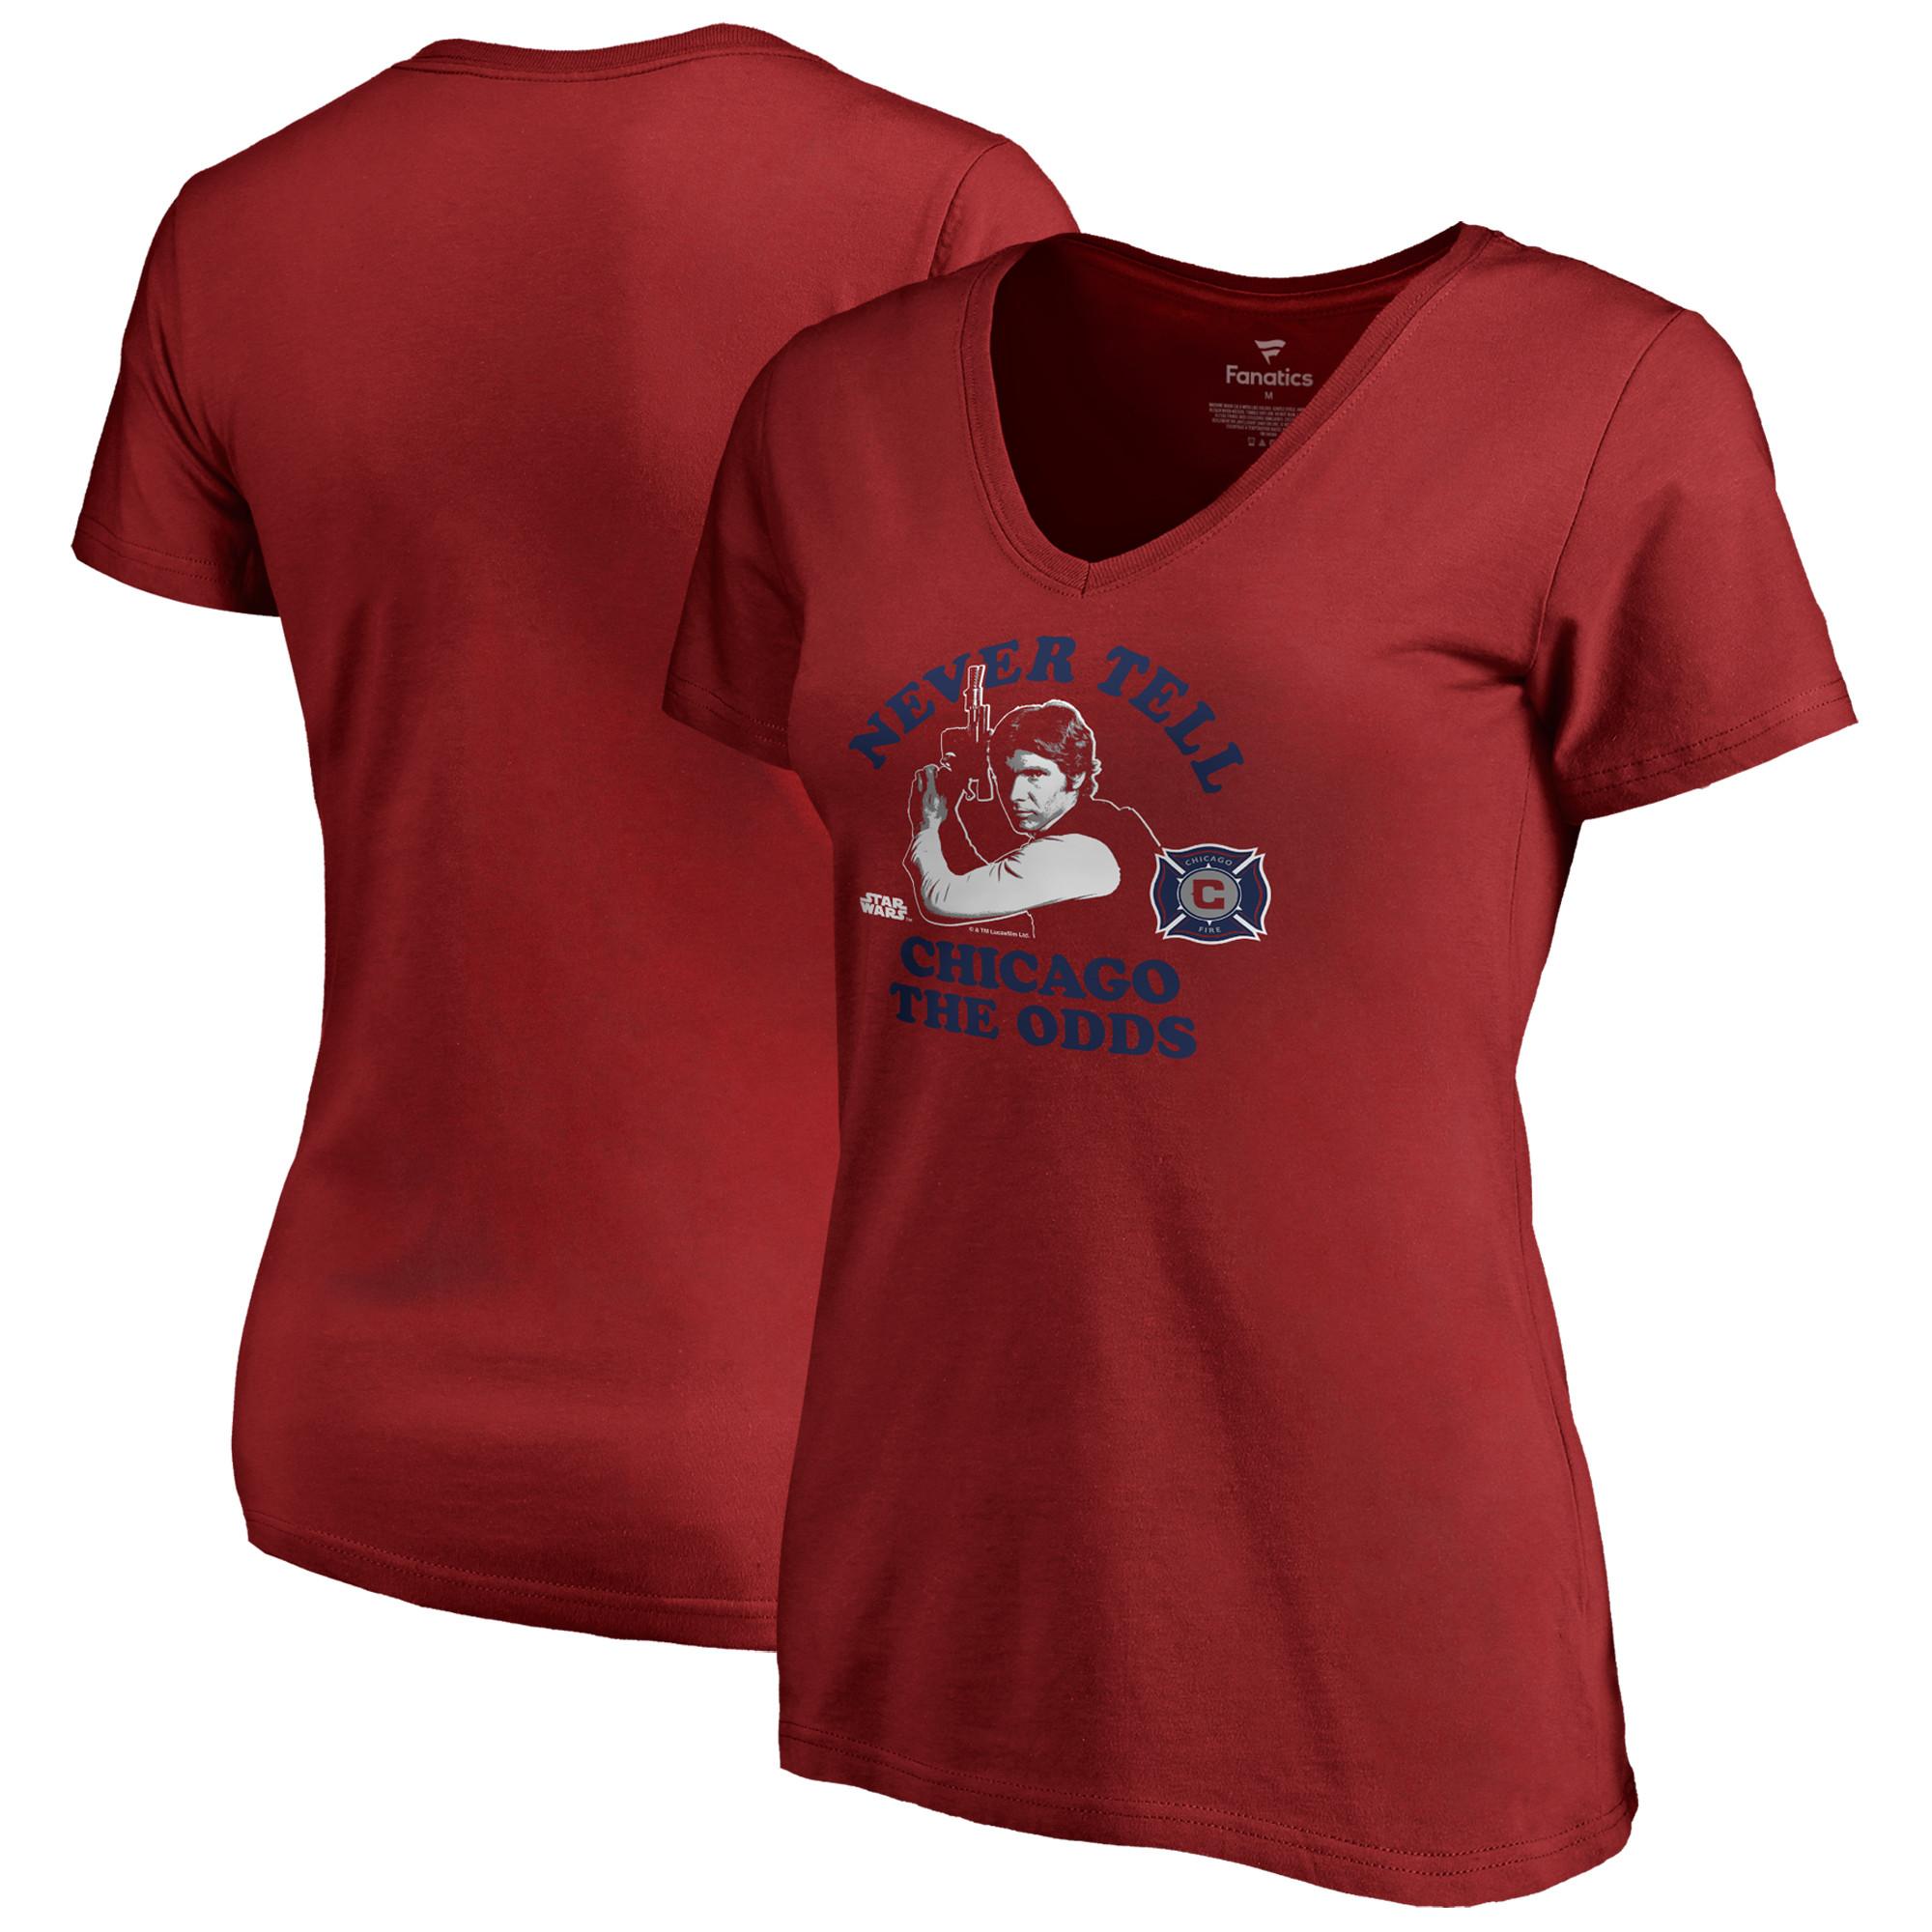 Chicago Fire Fanatics Branded Women's Star Wars Never Tell the Odds V-Neck T-Shirt - Red